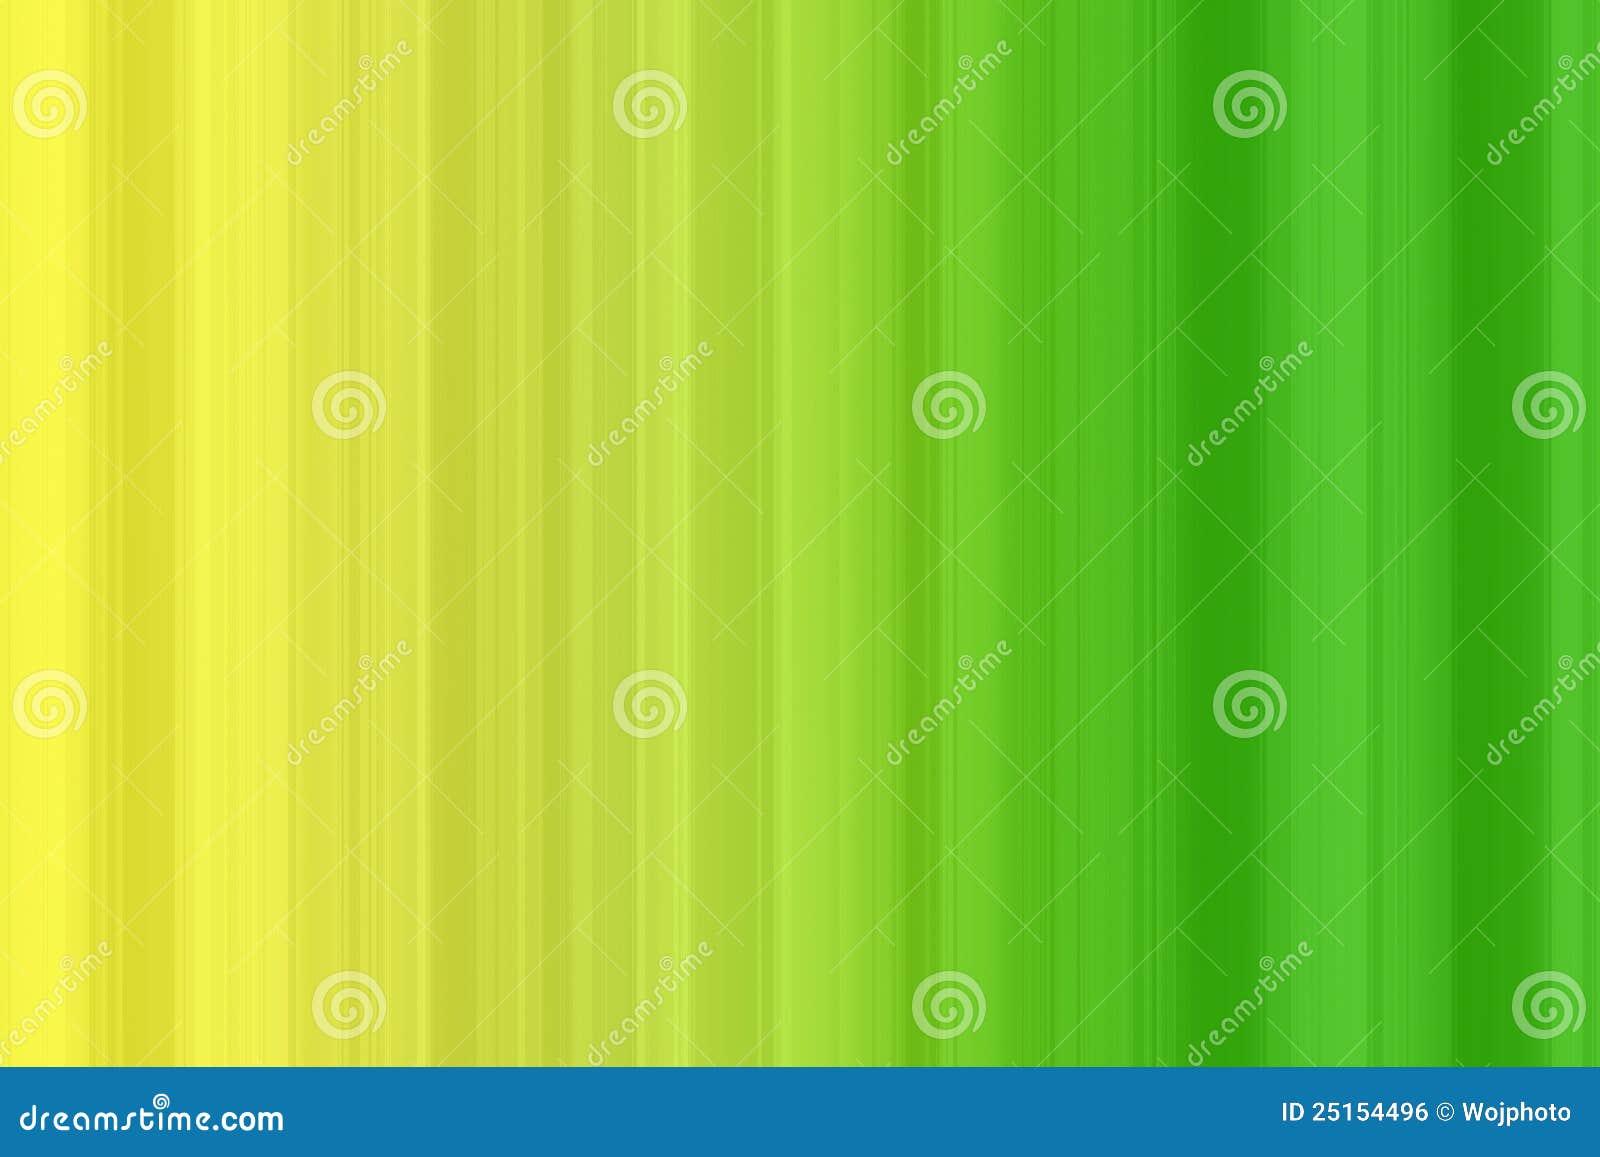 Green And Yellow Spectrum Bars Stock Illustration